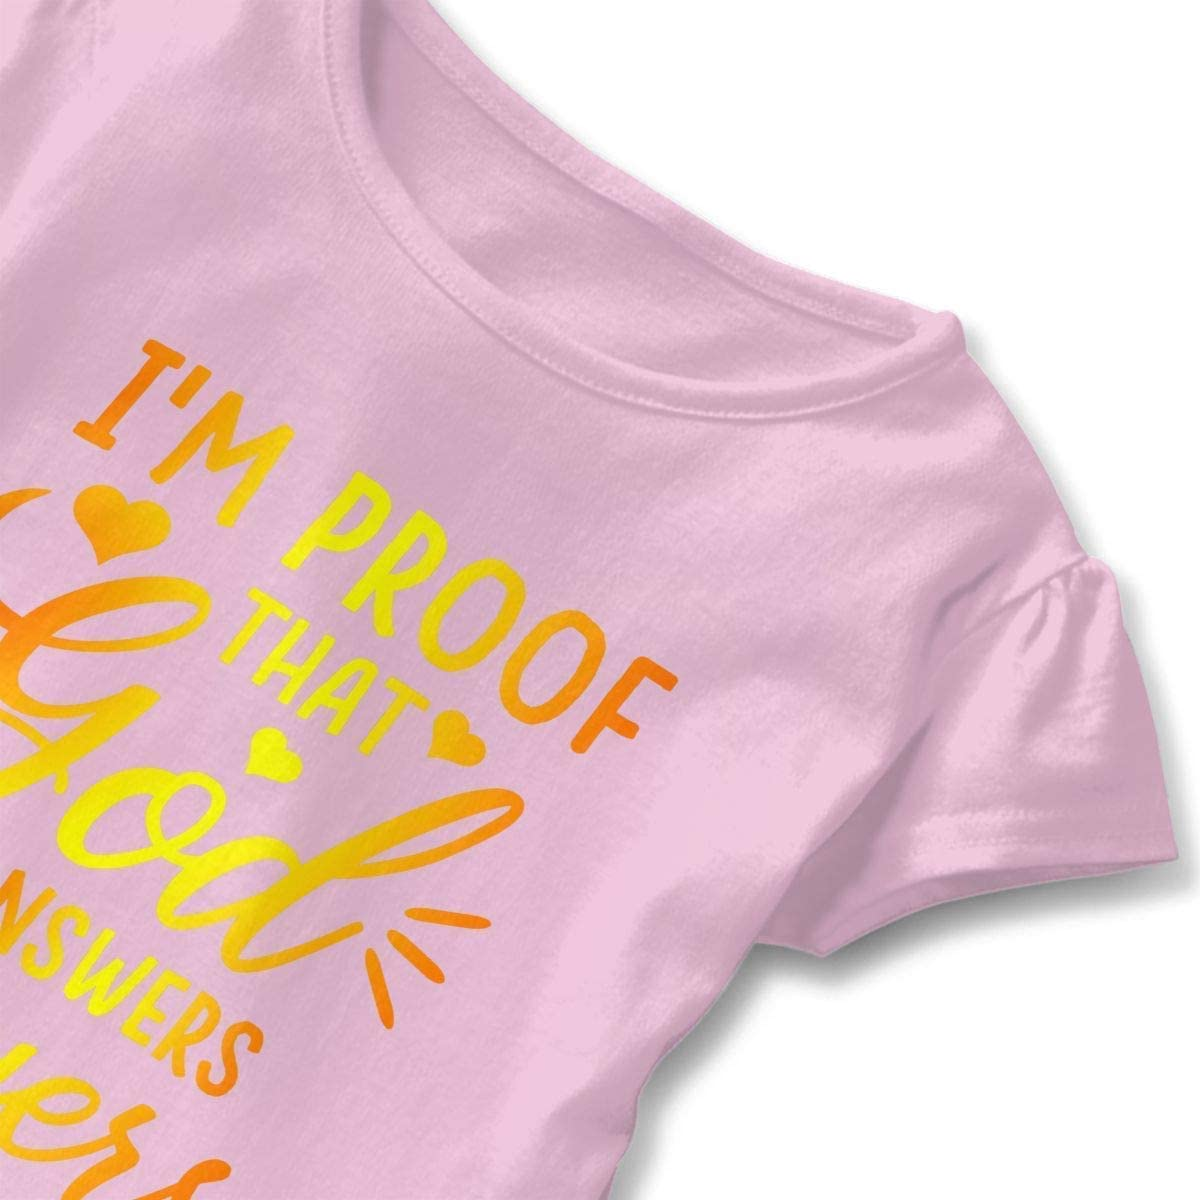 Toddler Girls Comfy Short Sleeve T-Shirt Im Proof That God Answers Prayers Girls Top